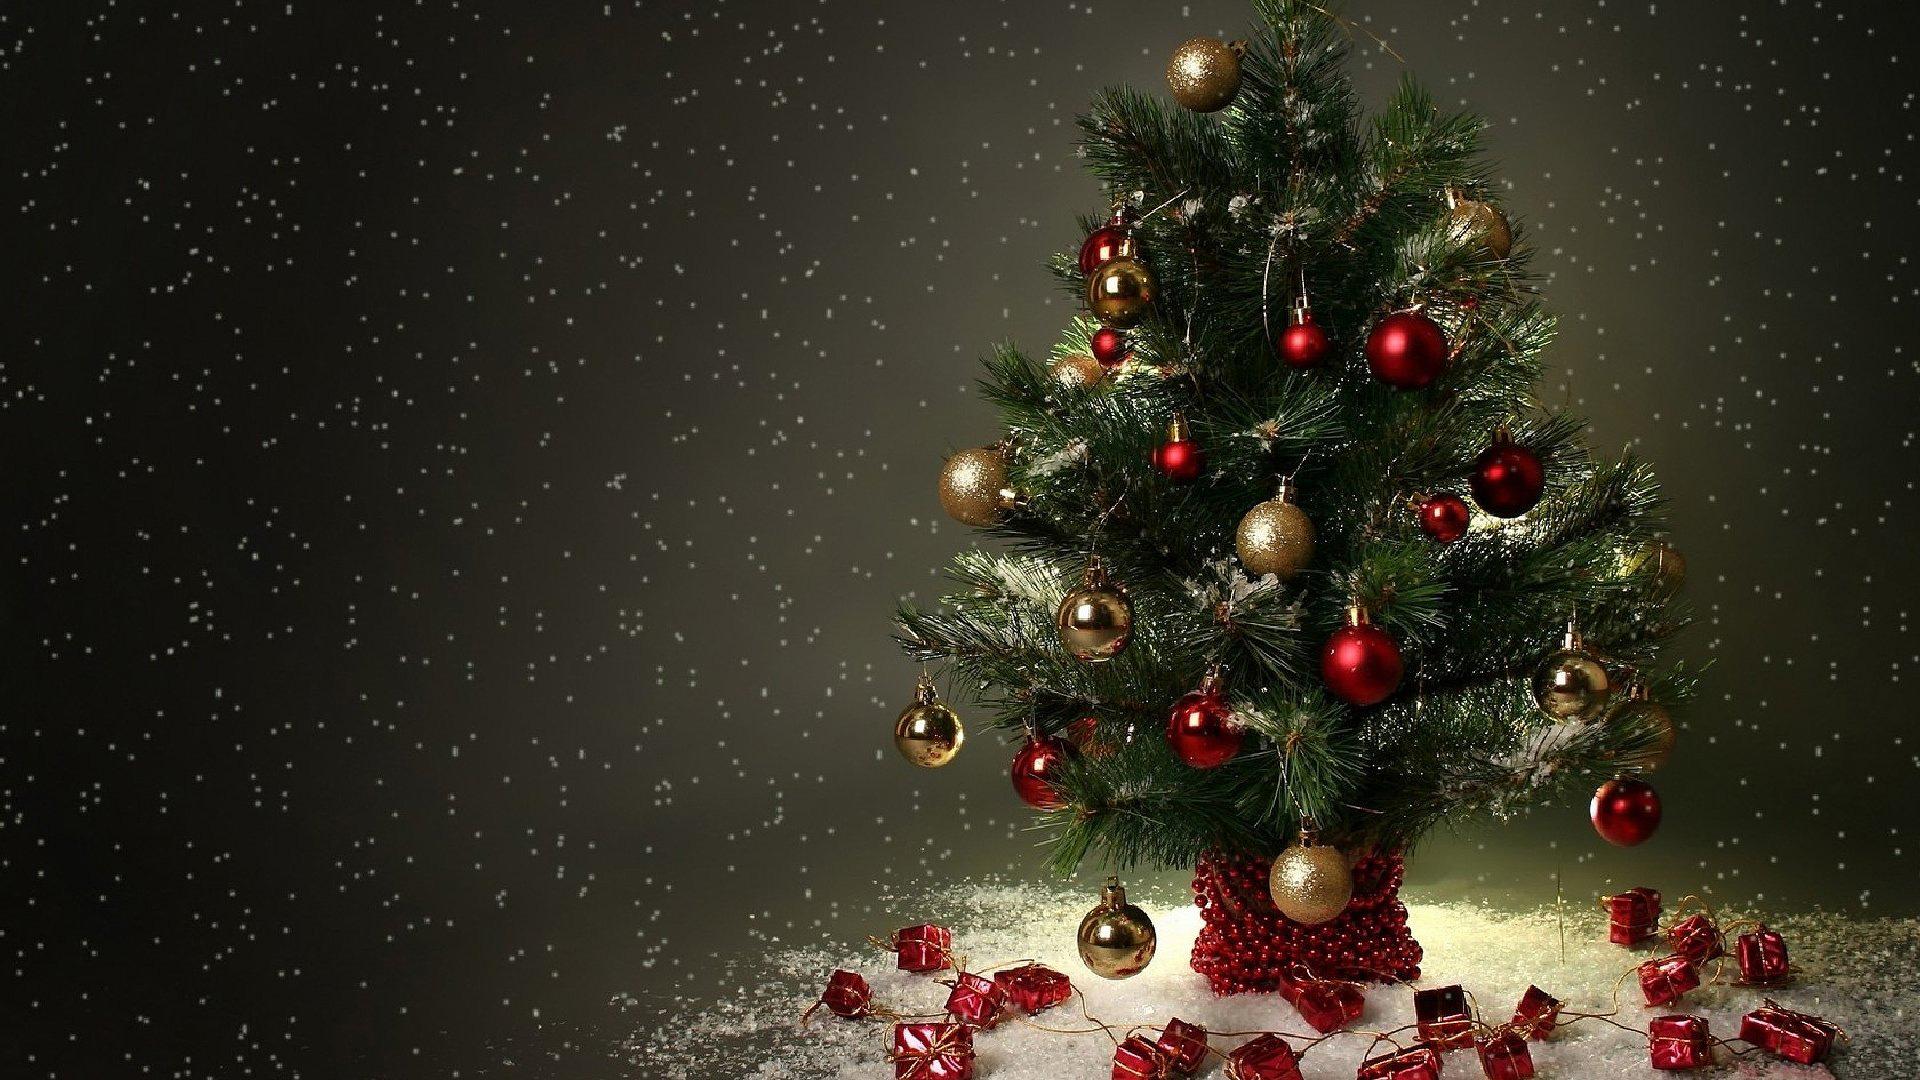 Little Christmas Tree   1920x1080   169 1920x1080